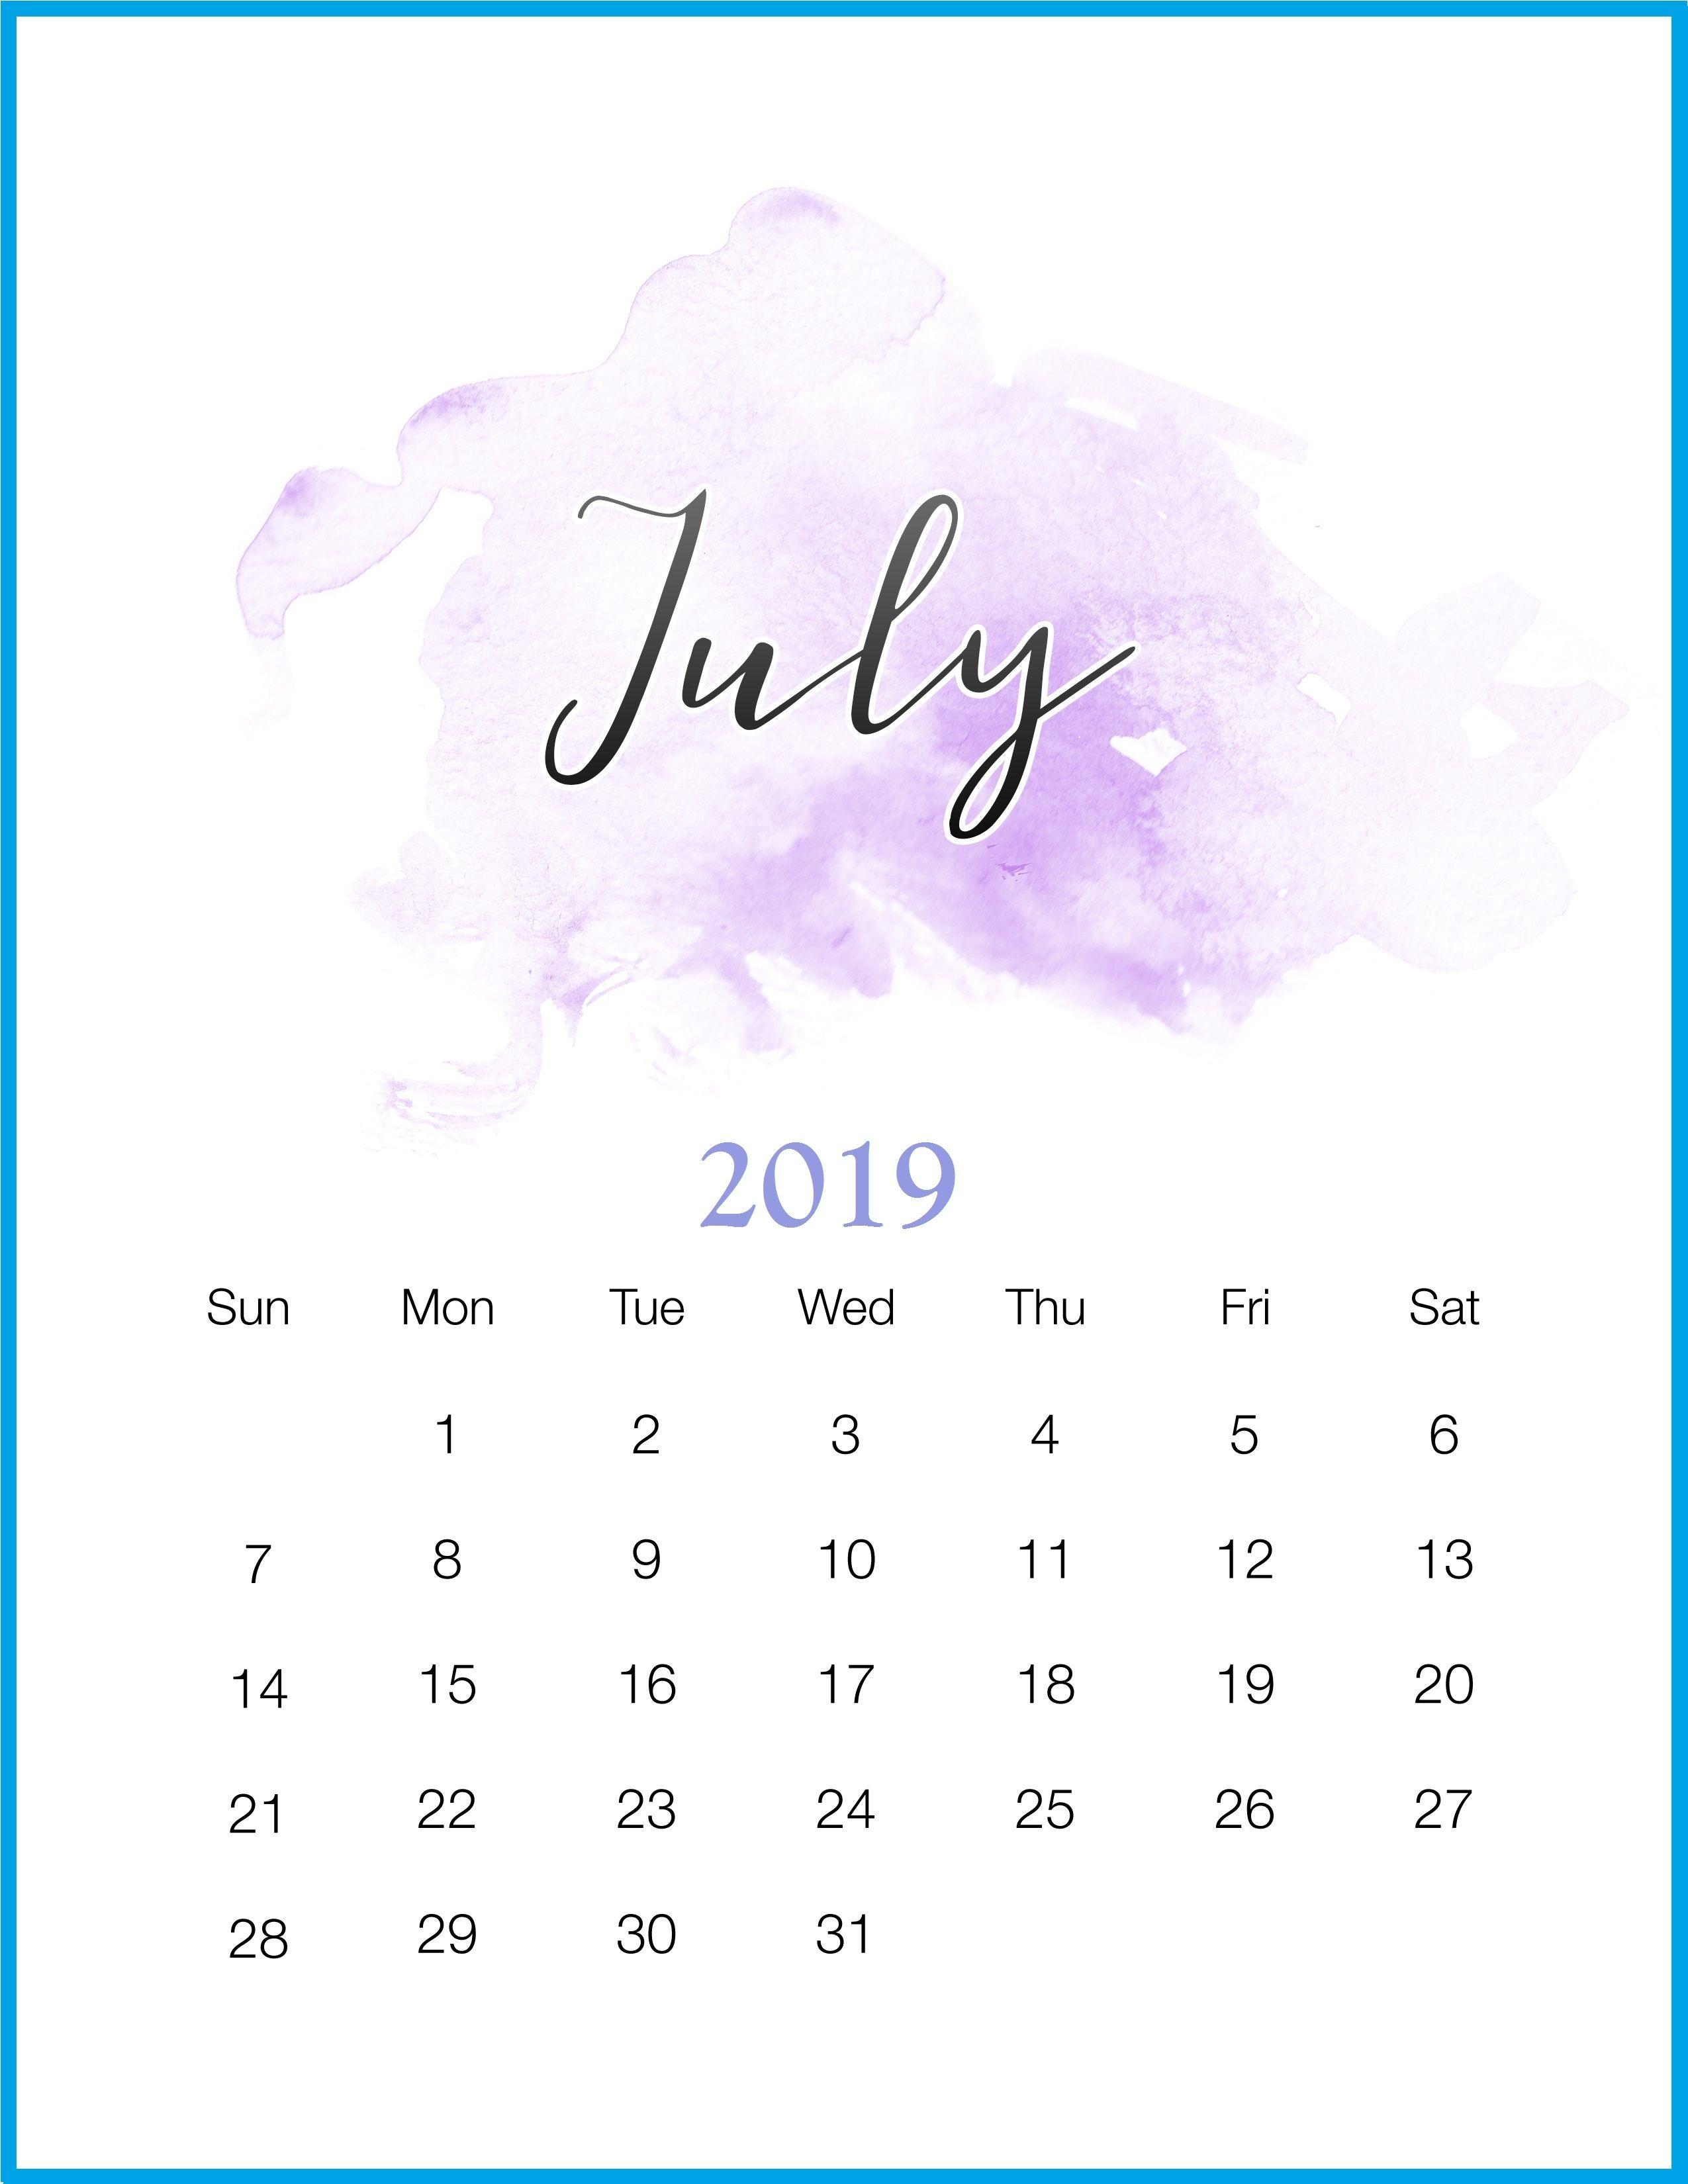 Get Free July 2019 Calendar Template Decemberjuly 2019